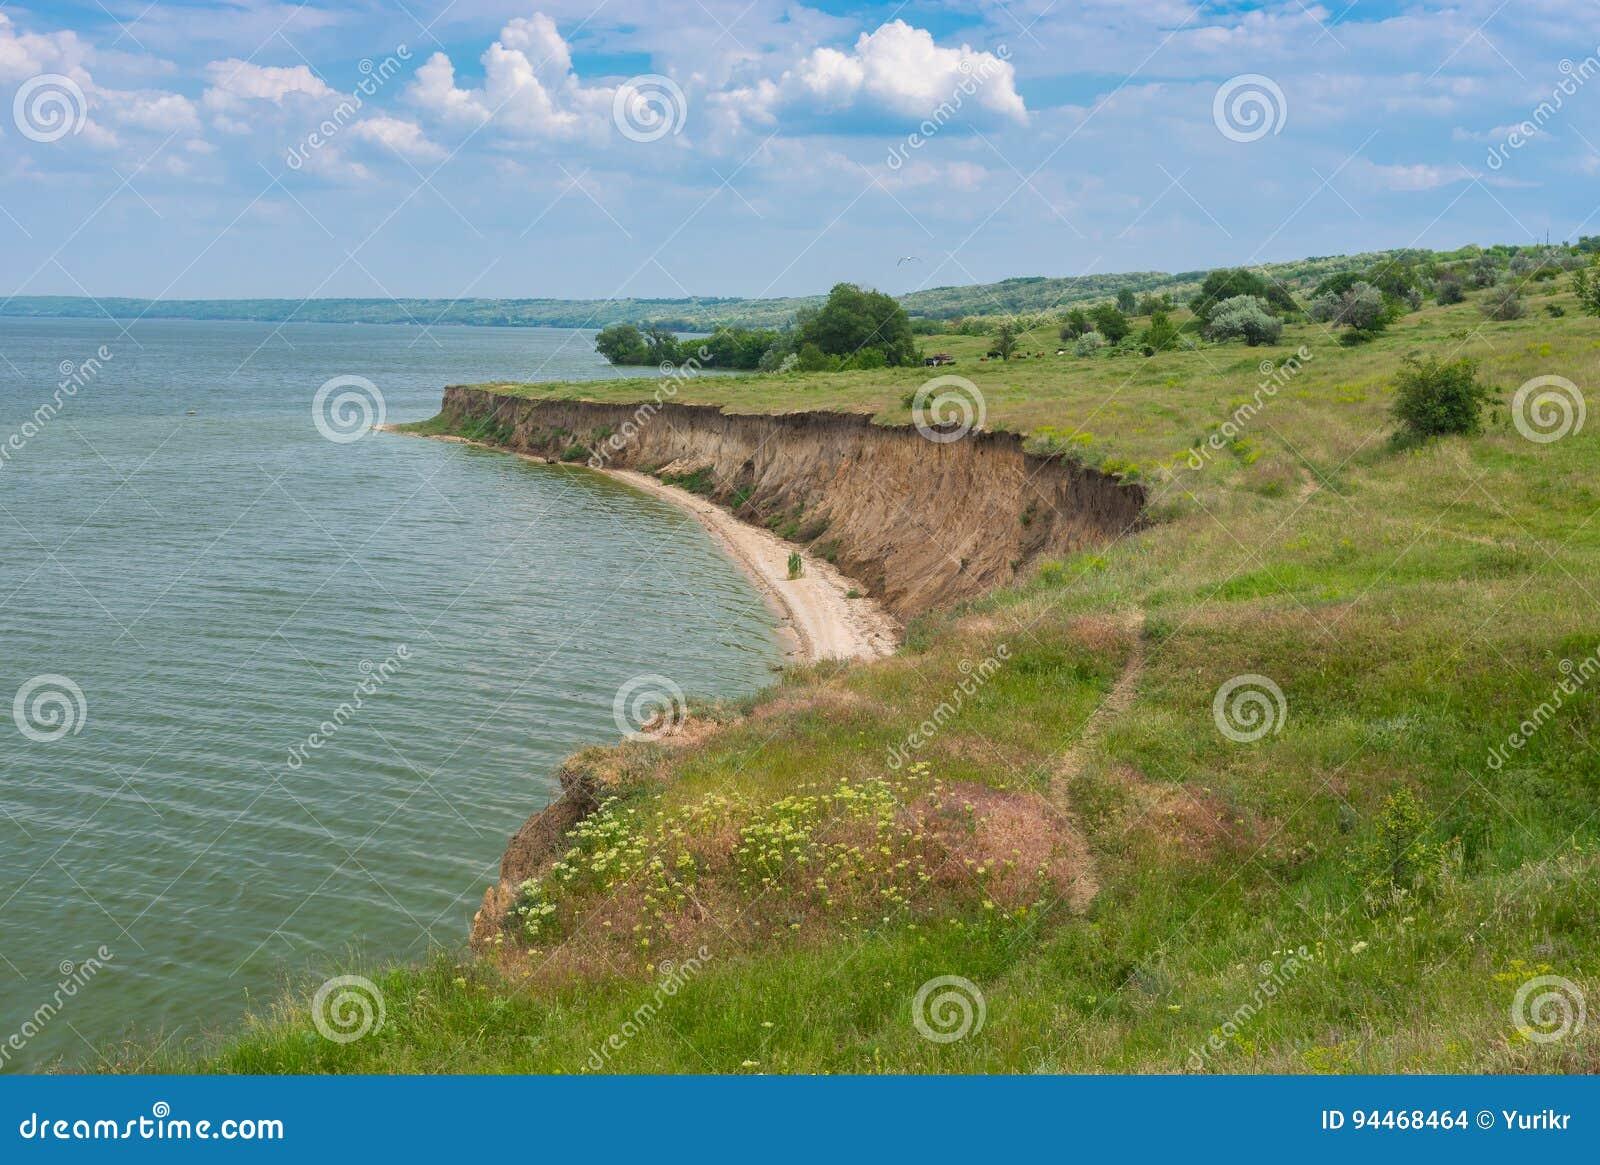 Landscape with Kakhovka Reservoir located on the Dnepr River, Ukraine